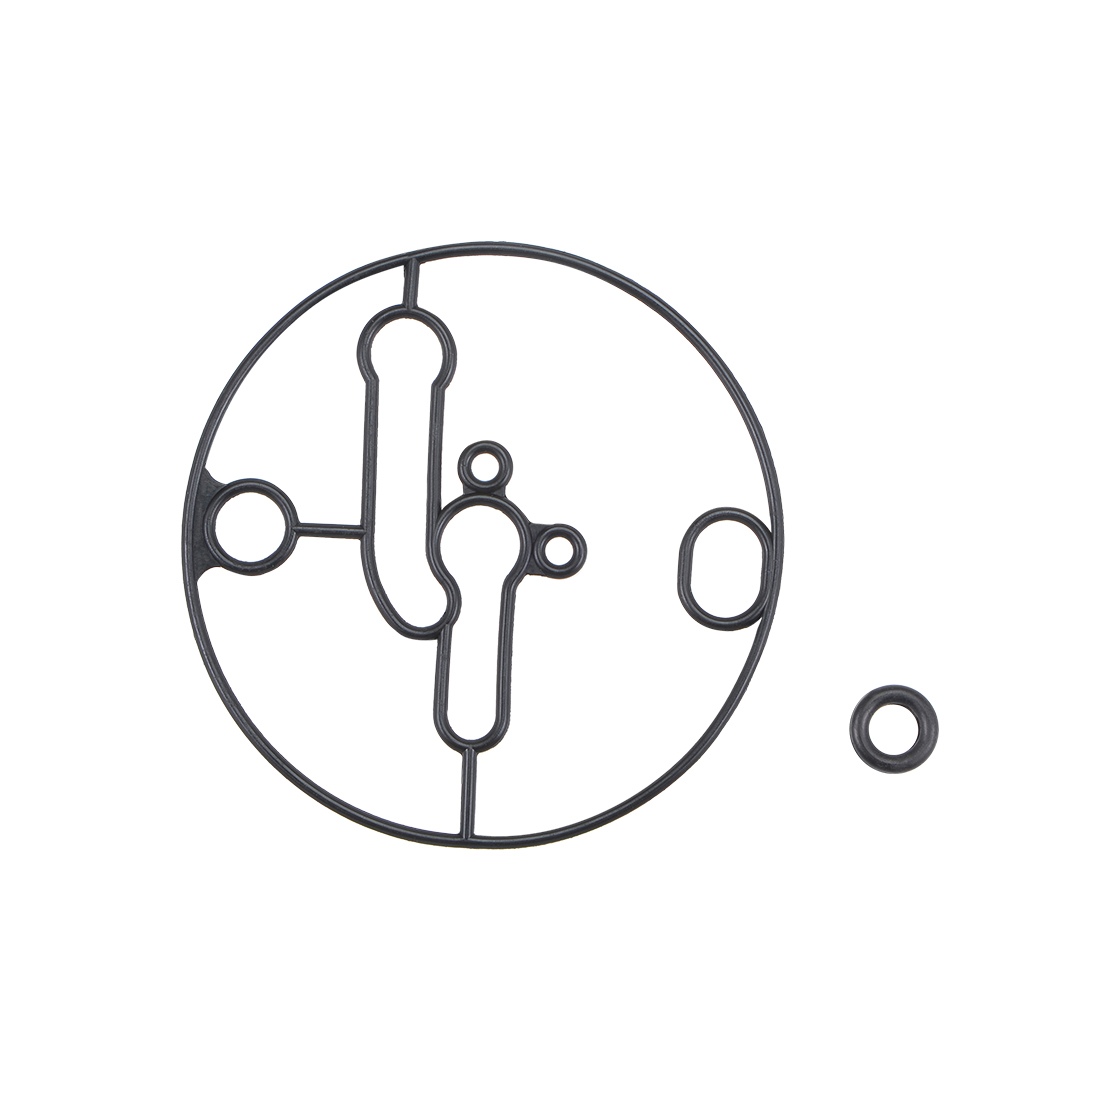 698781 Carburetor Rebuild Kit for Briggs Stratton 698781 Carburetor Carb 4pcs